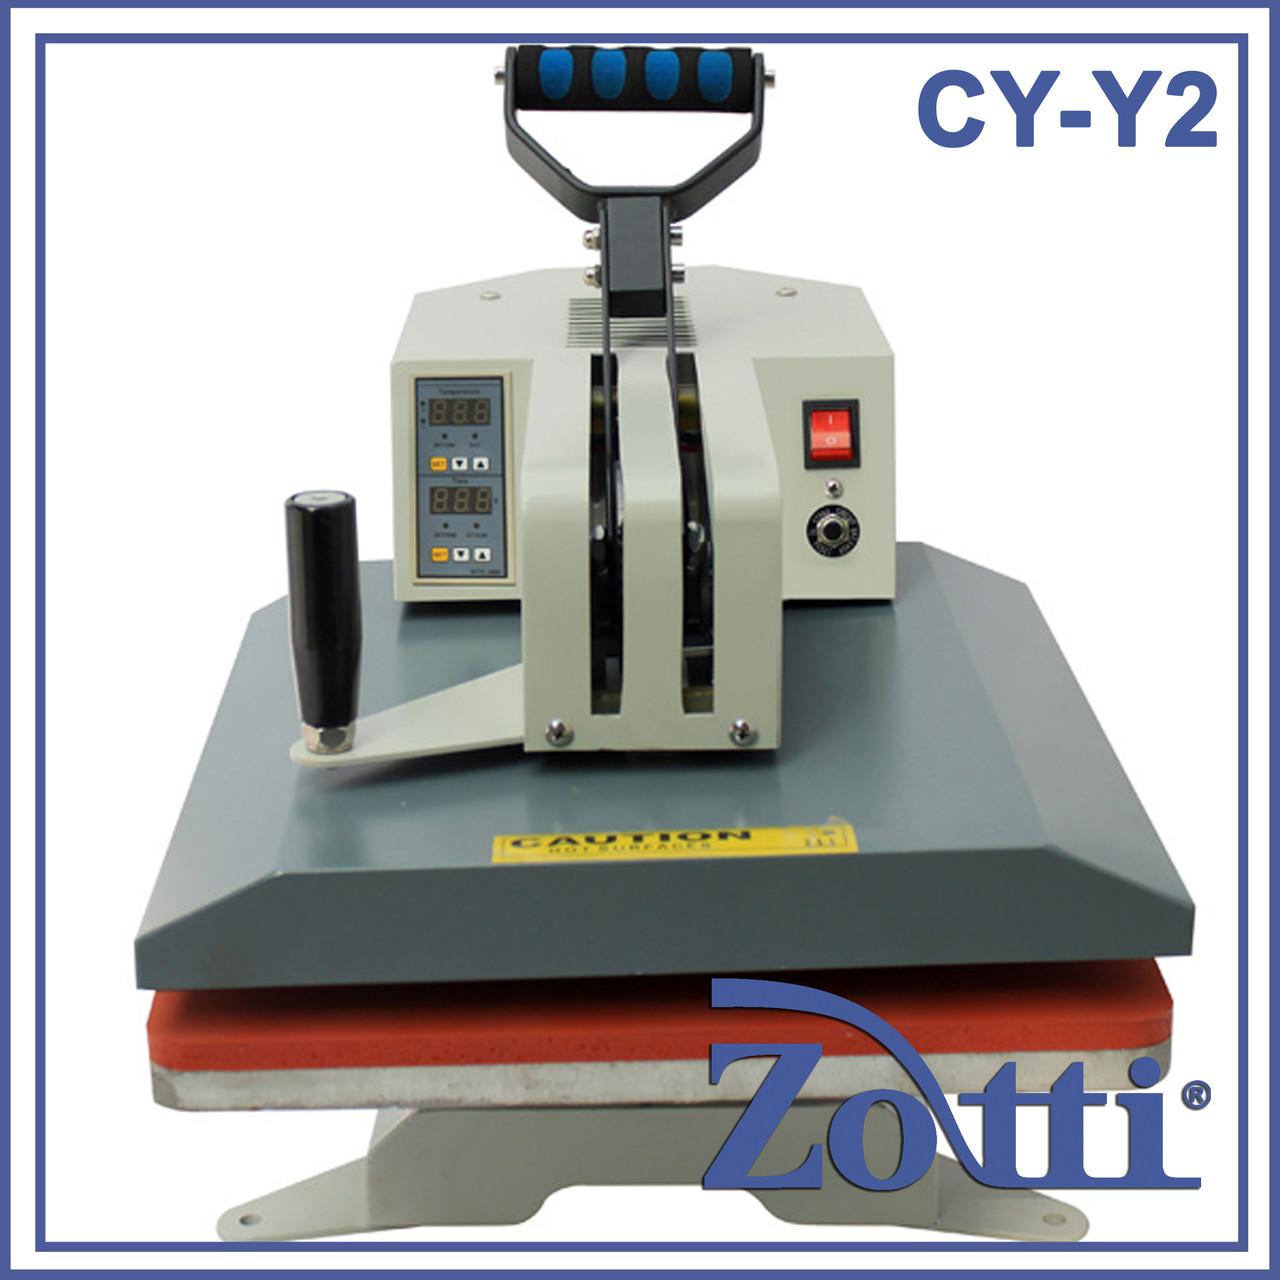 Дублирующий пресс для приклейки межподкладки CY-Y2 (Китай)